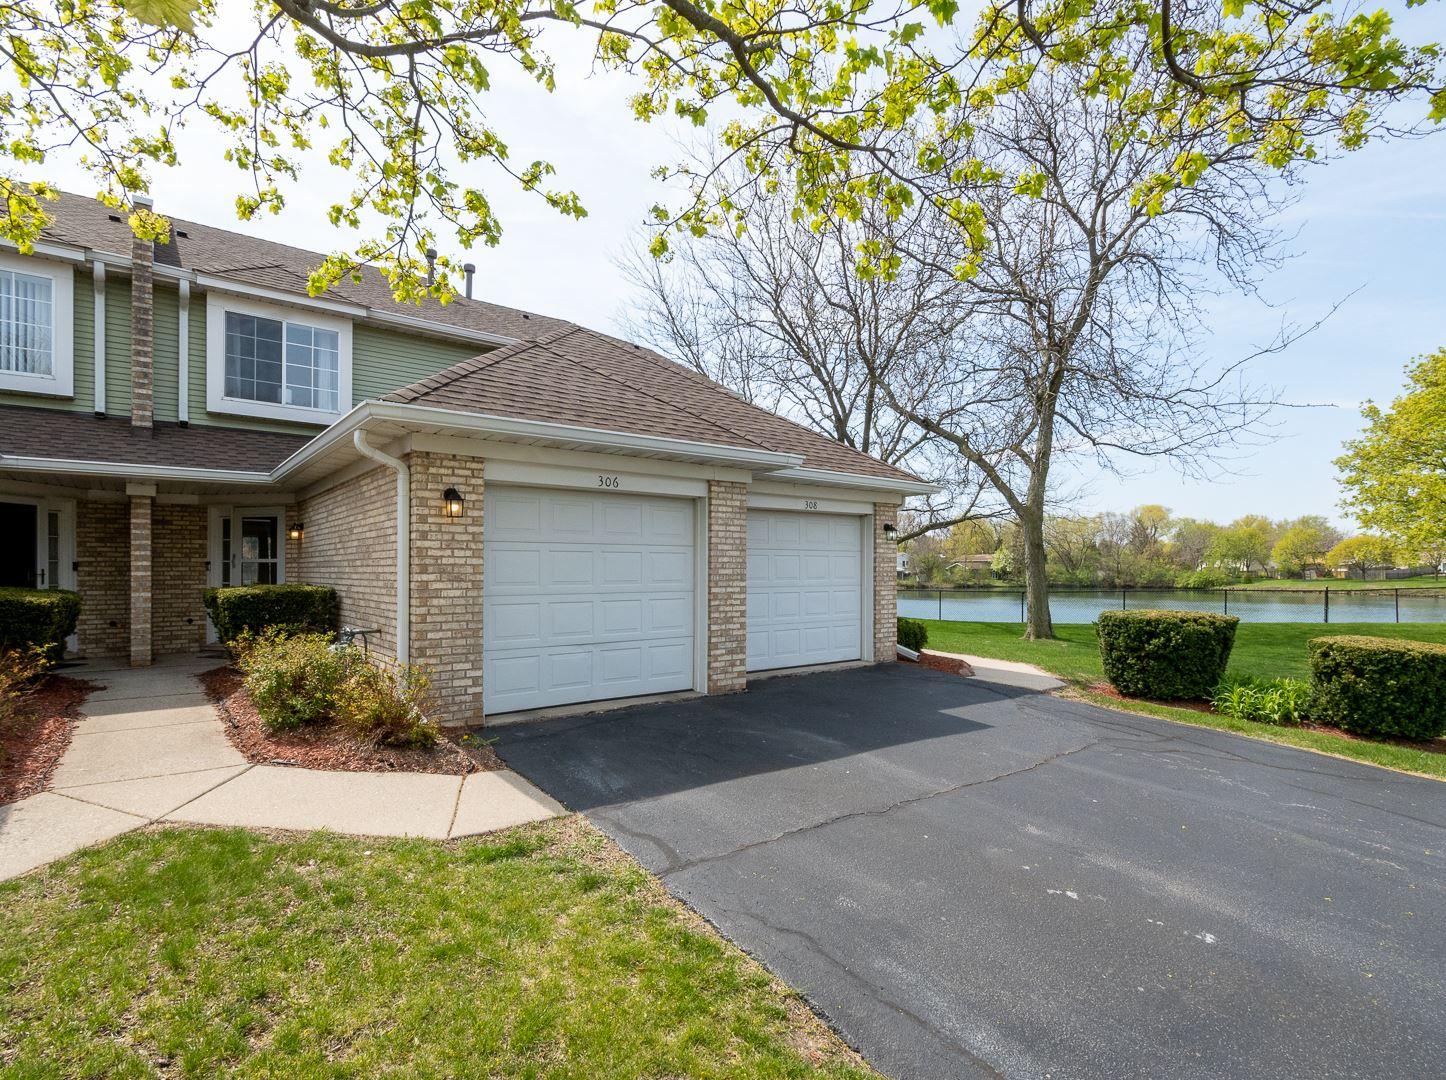 Photo of 306 Lakeview Circle, Bolingbrook, IL 60440 (MLS # 11069609)